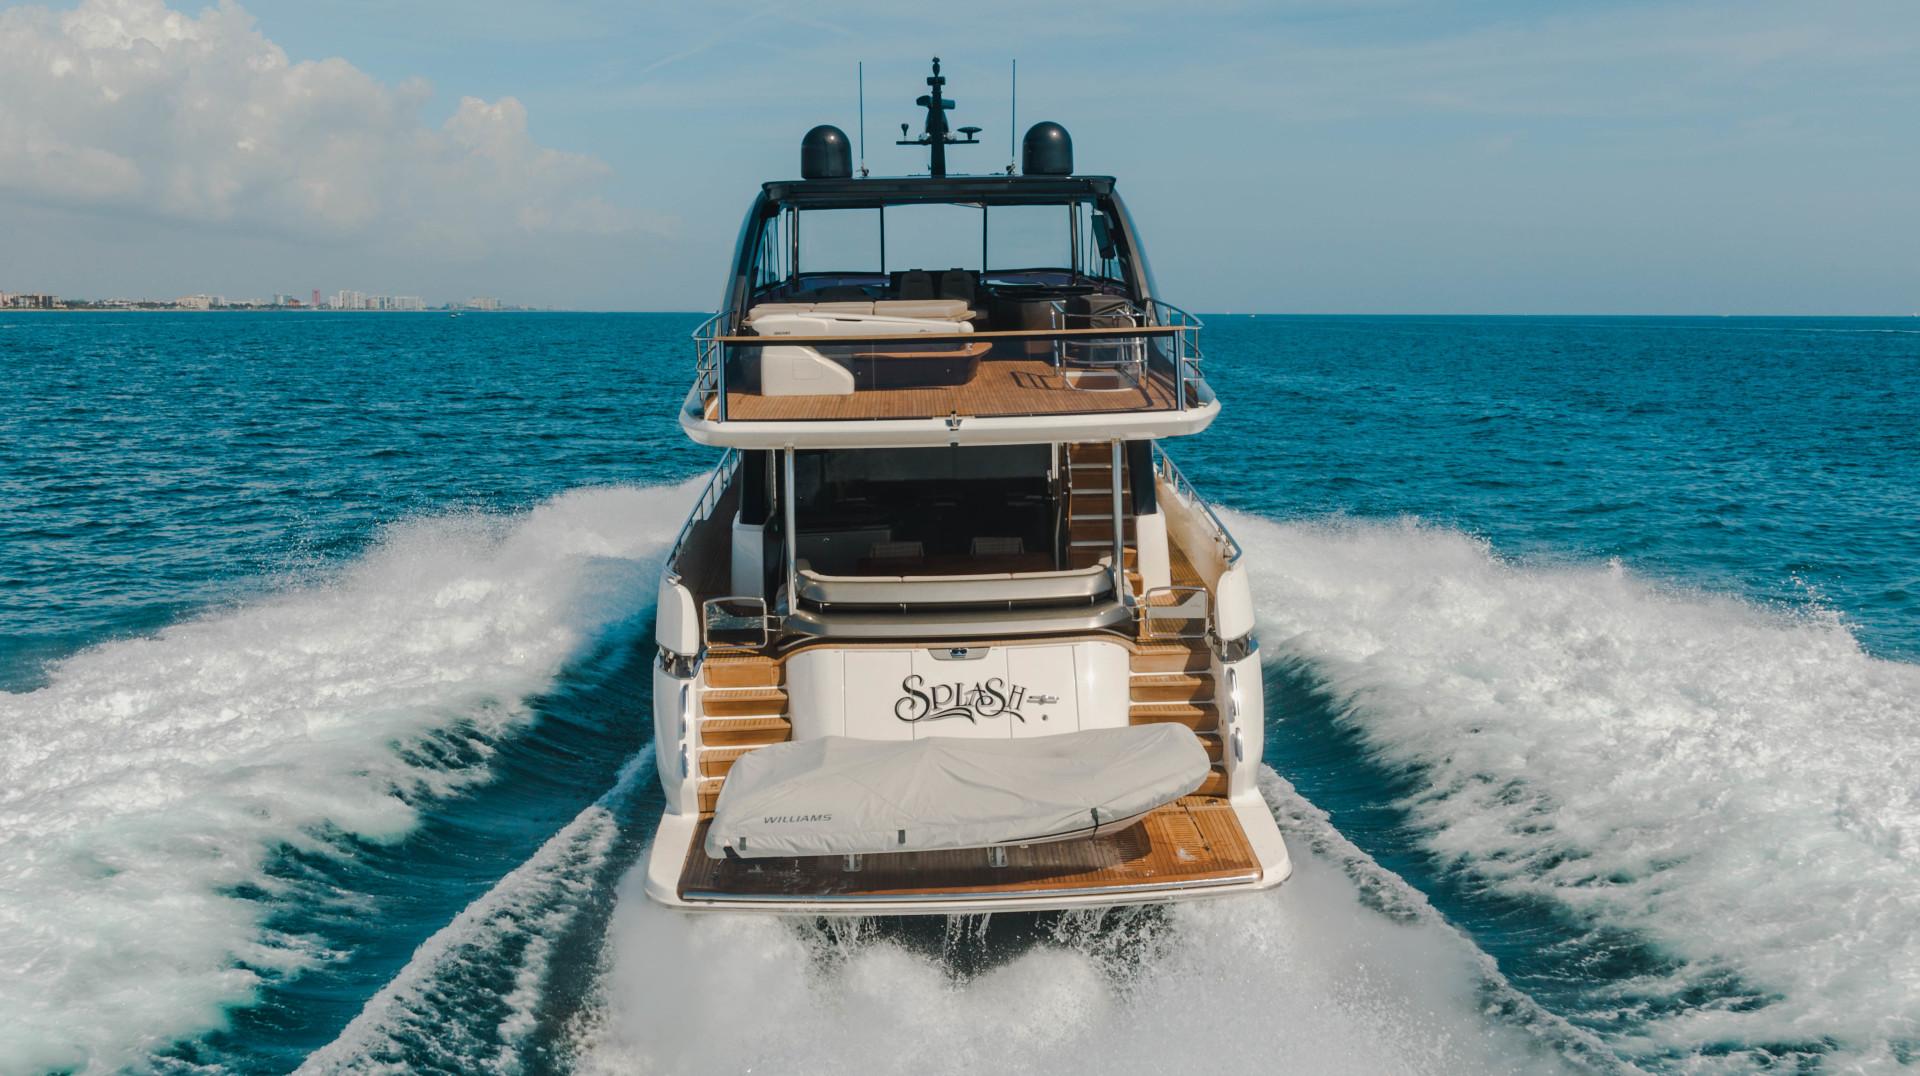 Princess-Y85  2019-Splash Delray Beach-Florida-United States-1631594 | Thumbnail